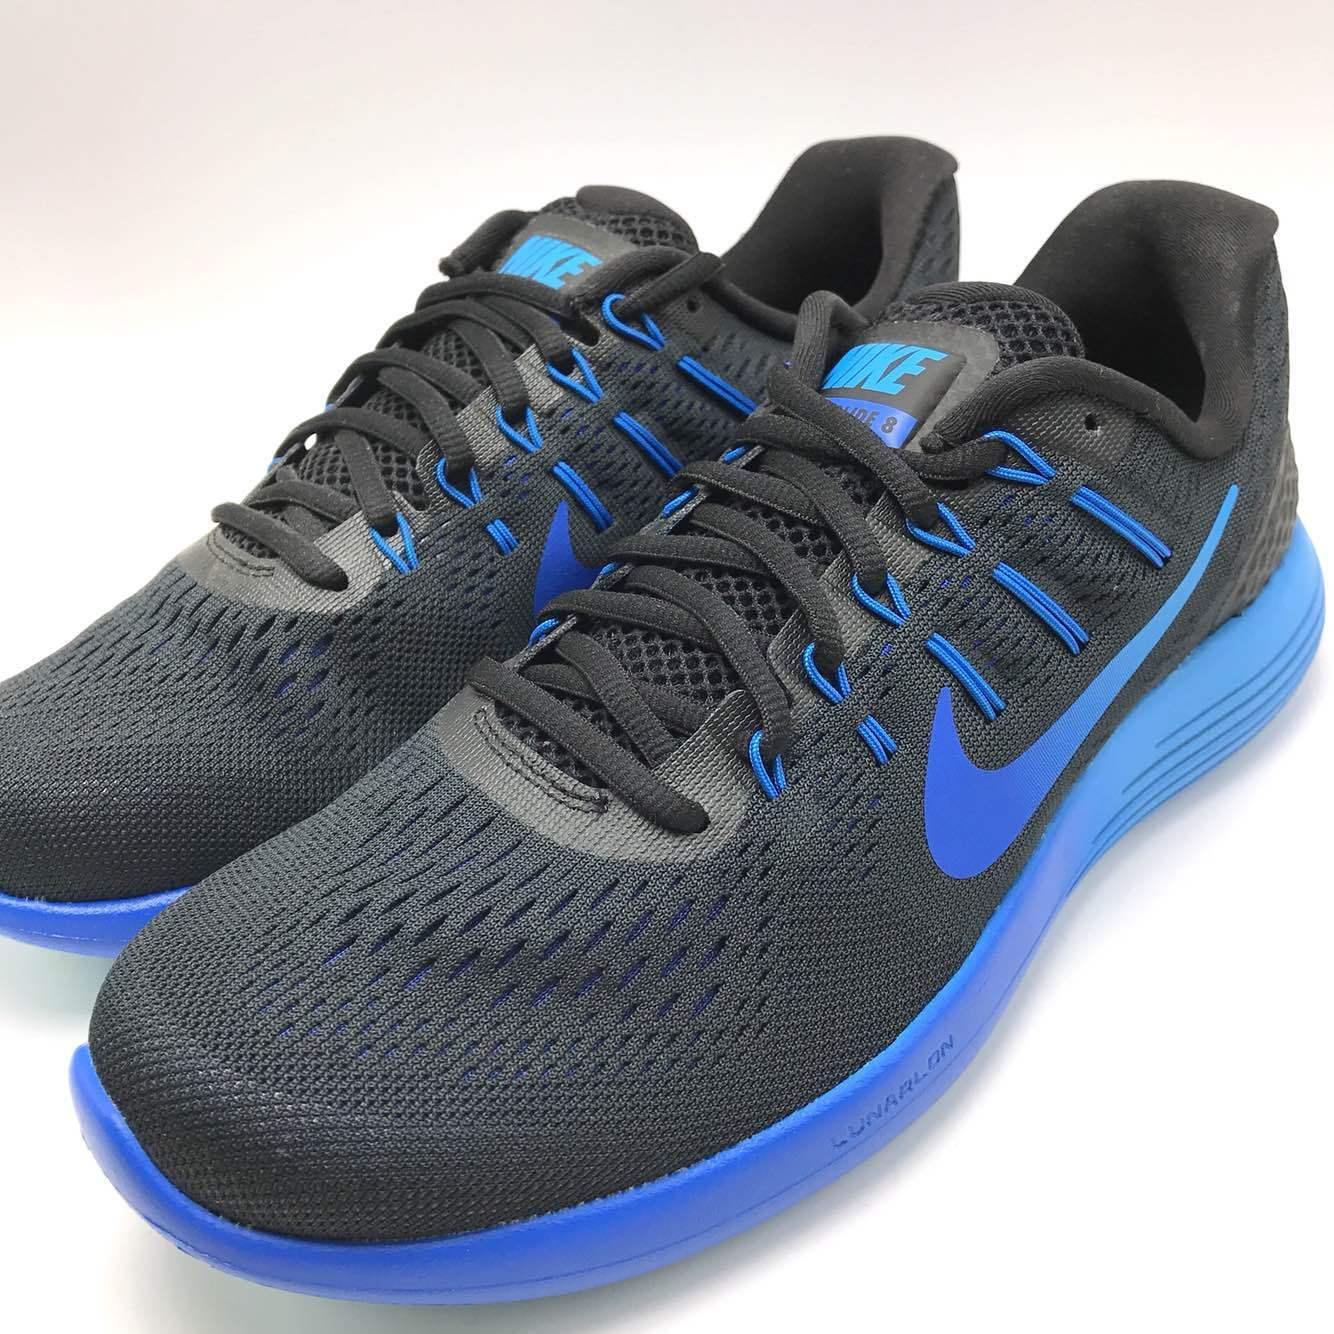 Nike Men's Lunarglide 8 Black/Deep Royal Hypr CBL Running Shoes 843725-004